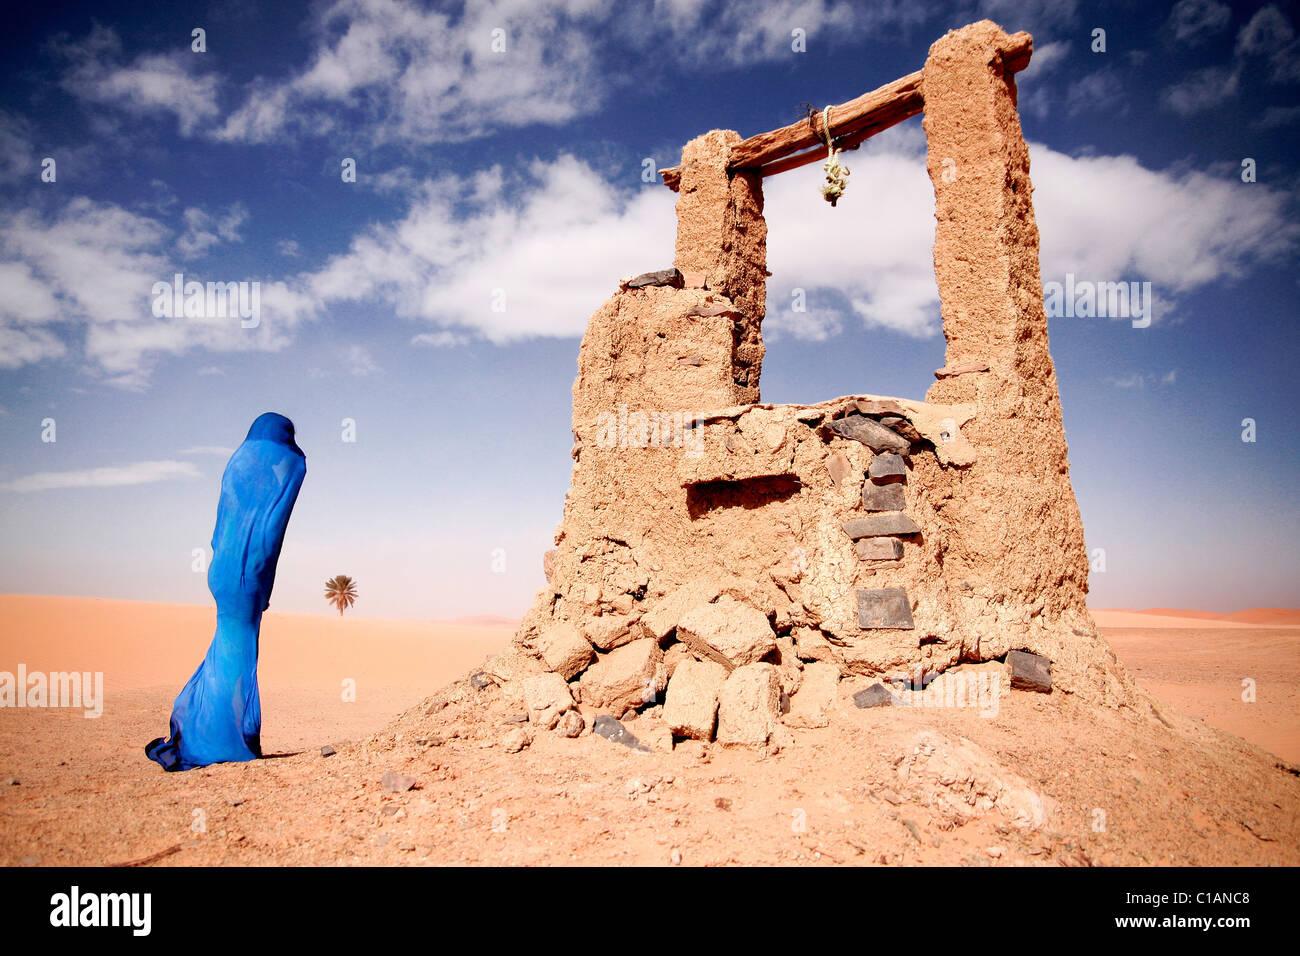 Water well, Sahara Desert, Morocco, North Africa - Stock Image